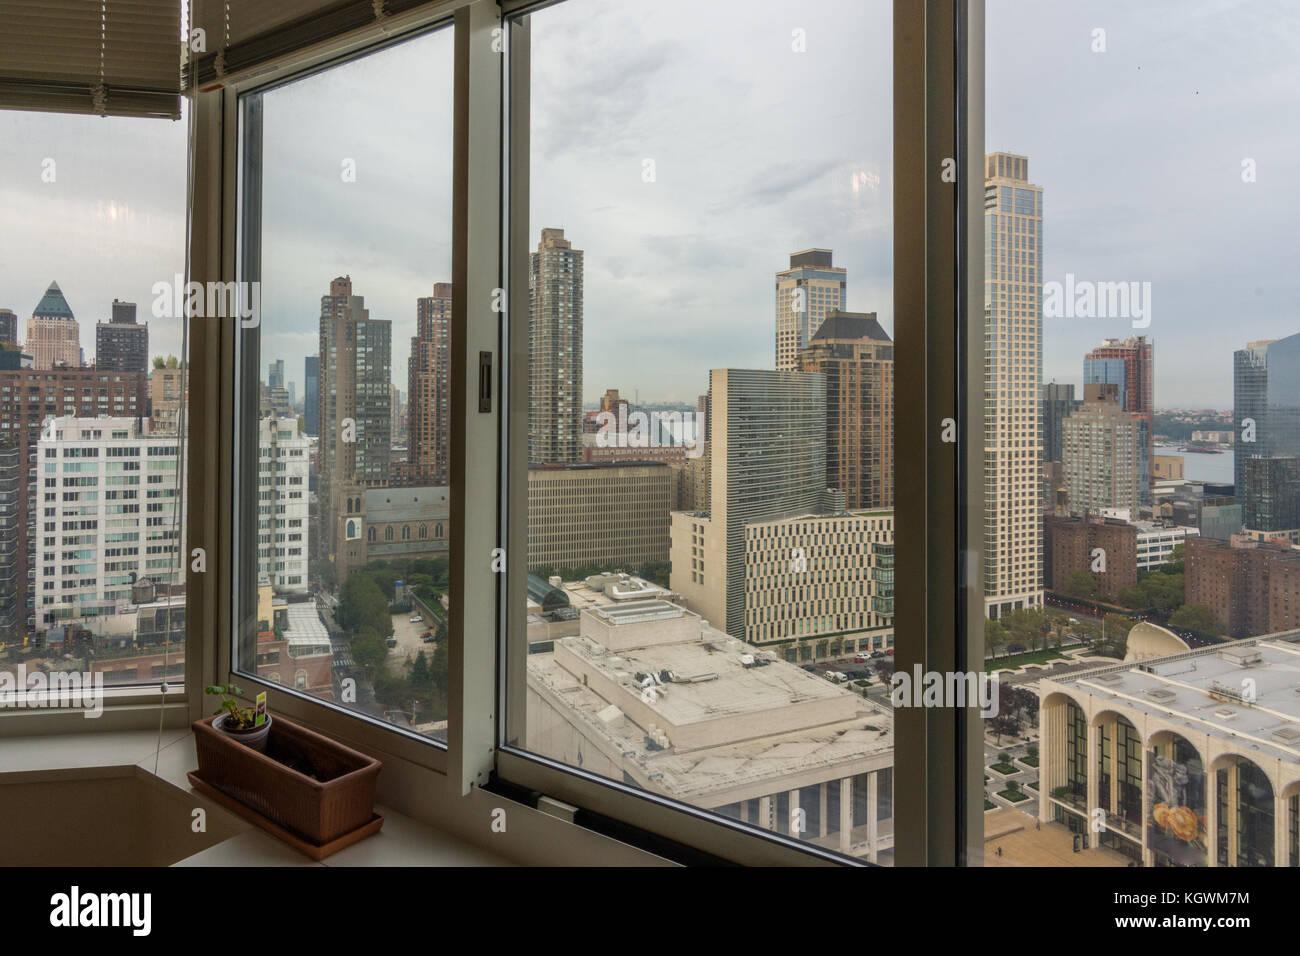 New York High Rise Sunrise Stockfotos & New York High Rise Sunrise ...